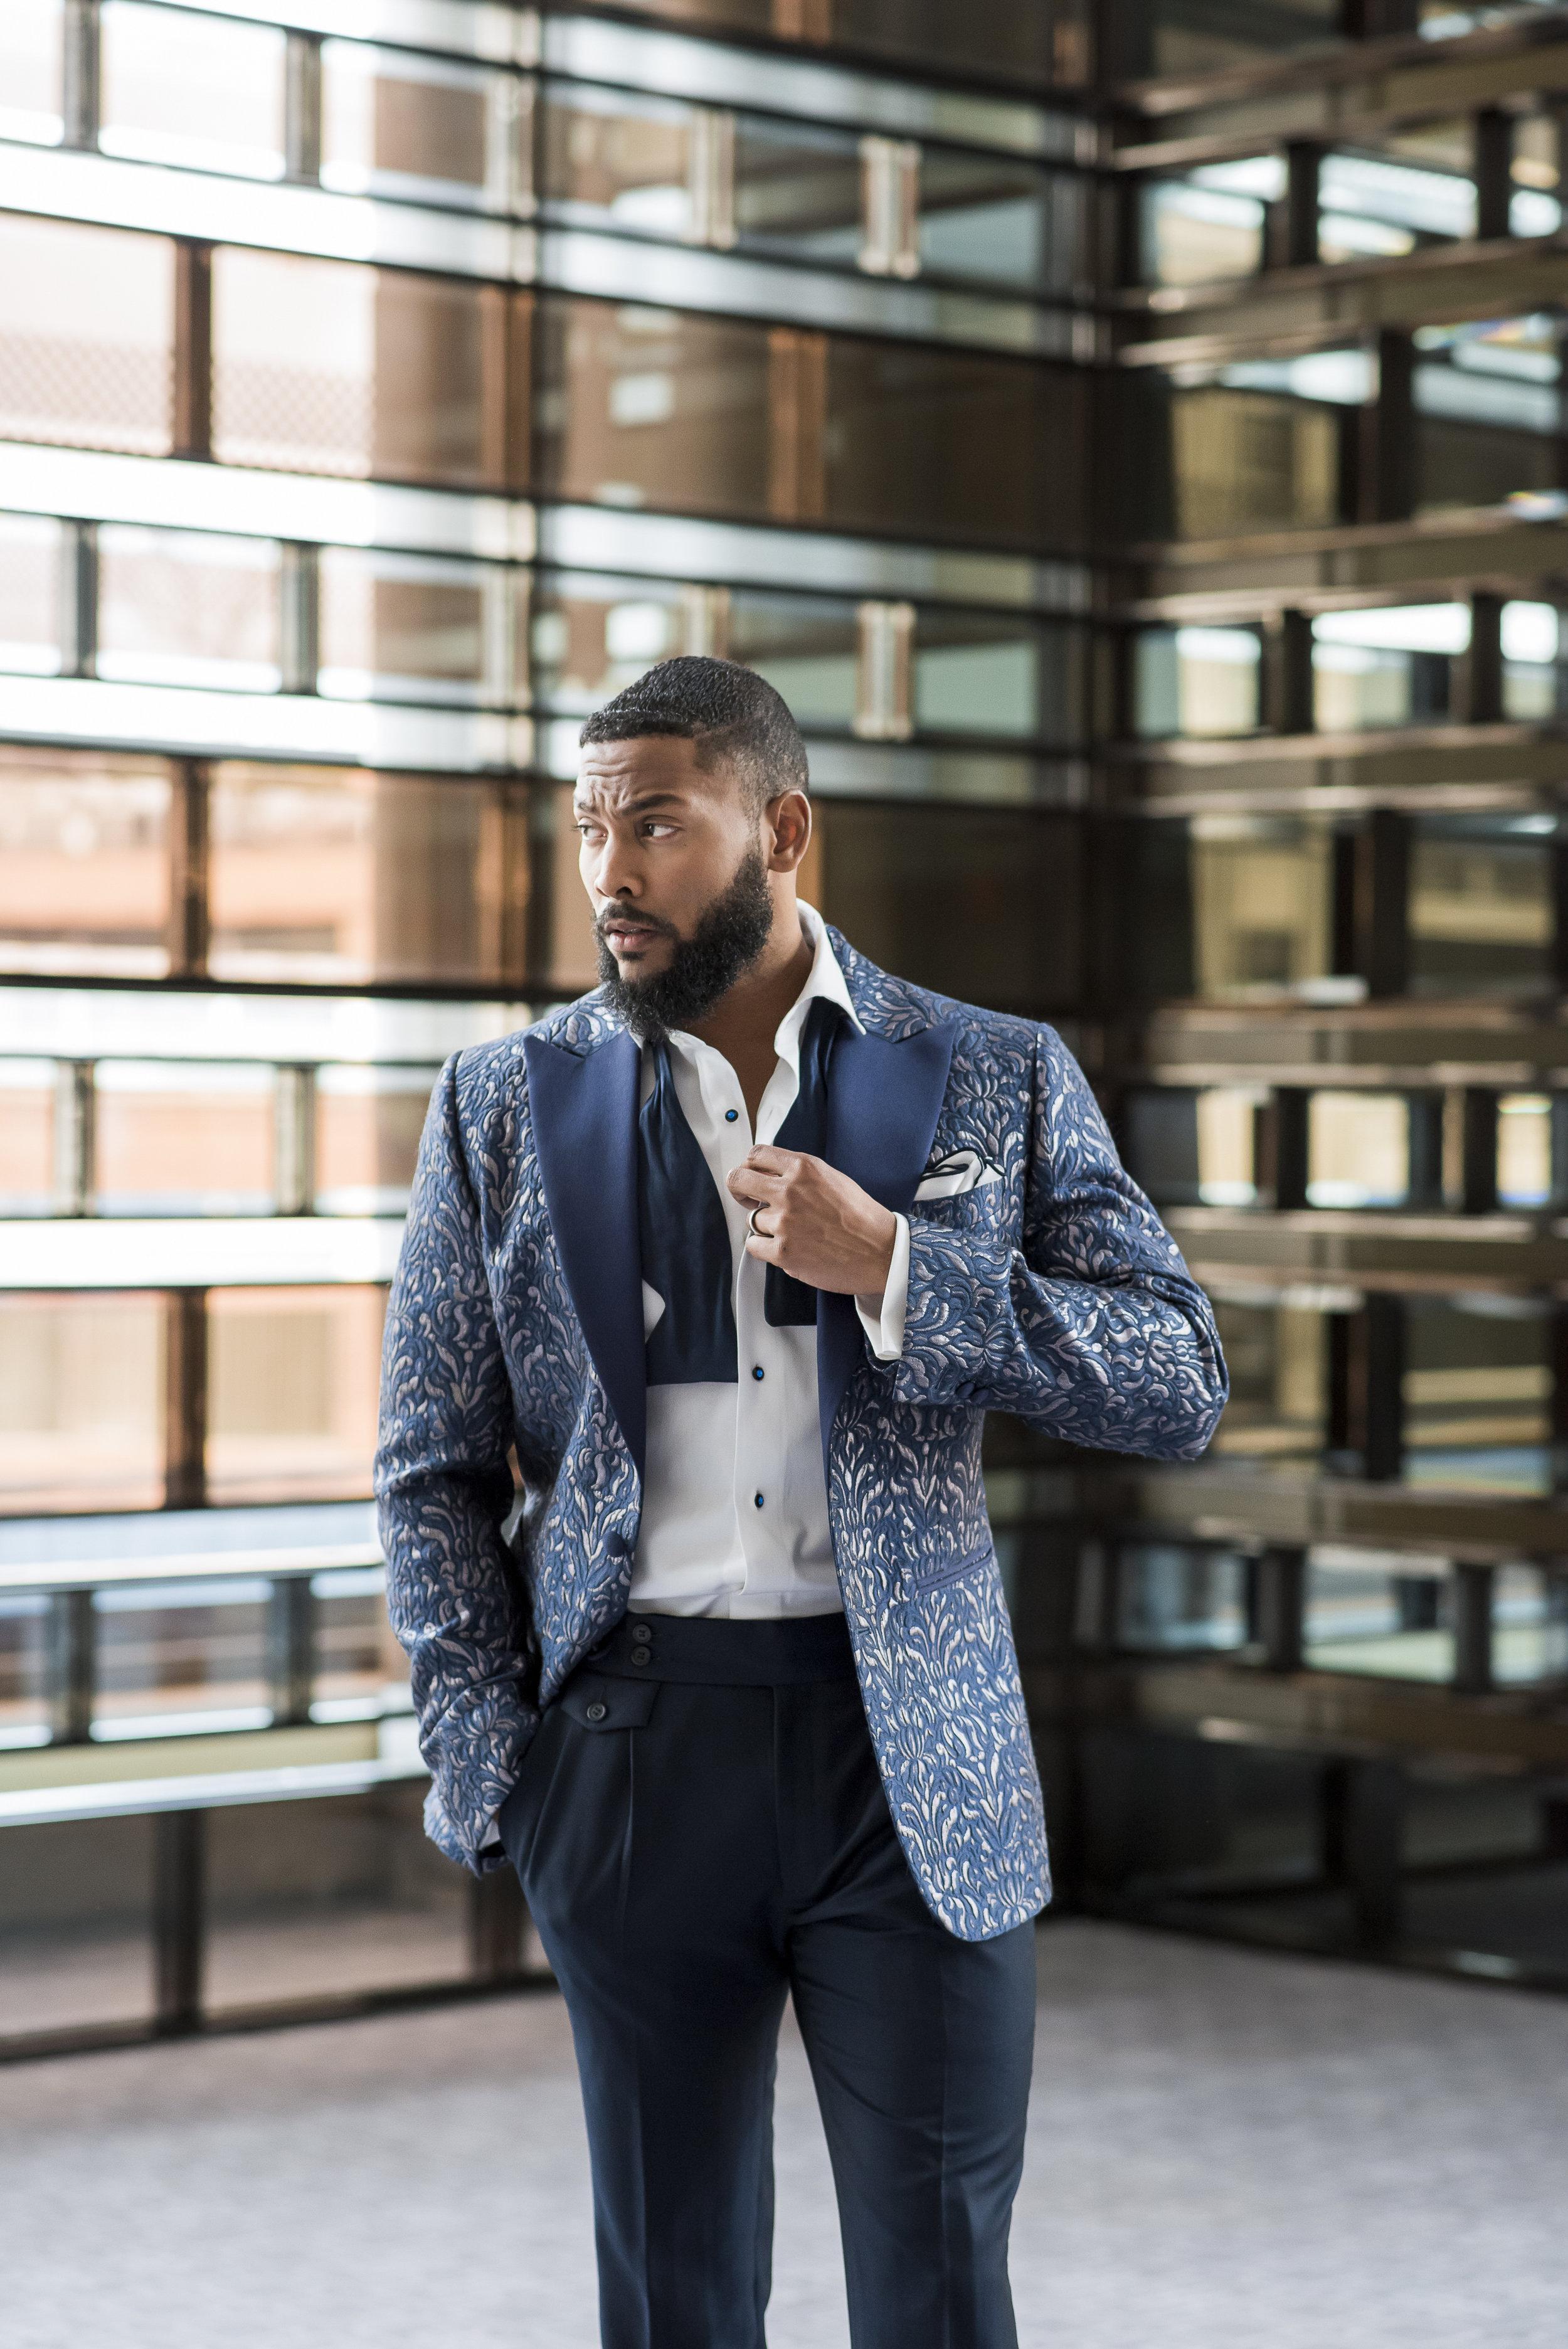 August In Bloom - Groom in patterned suit - The Suited Groom (The Bridal Affair)